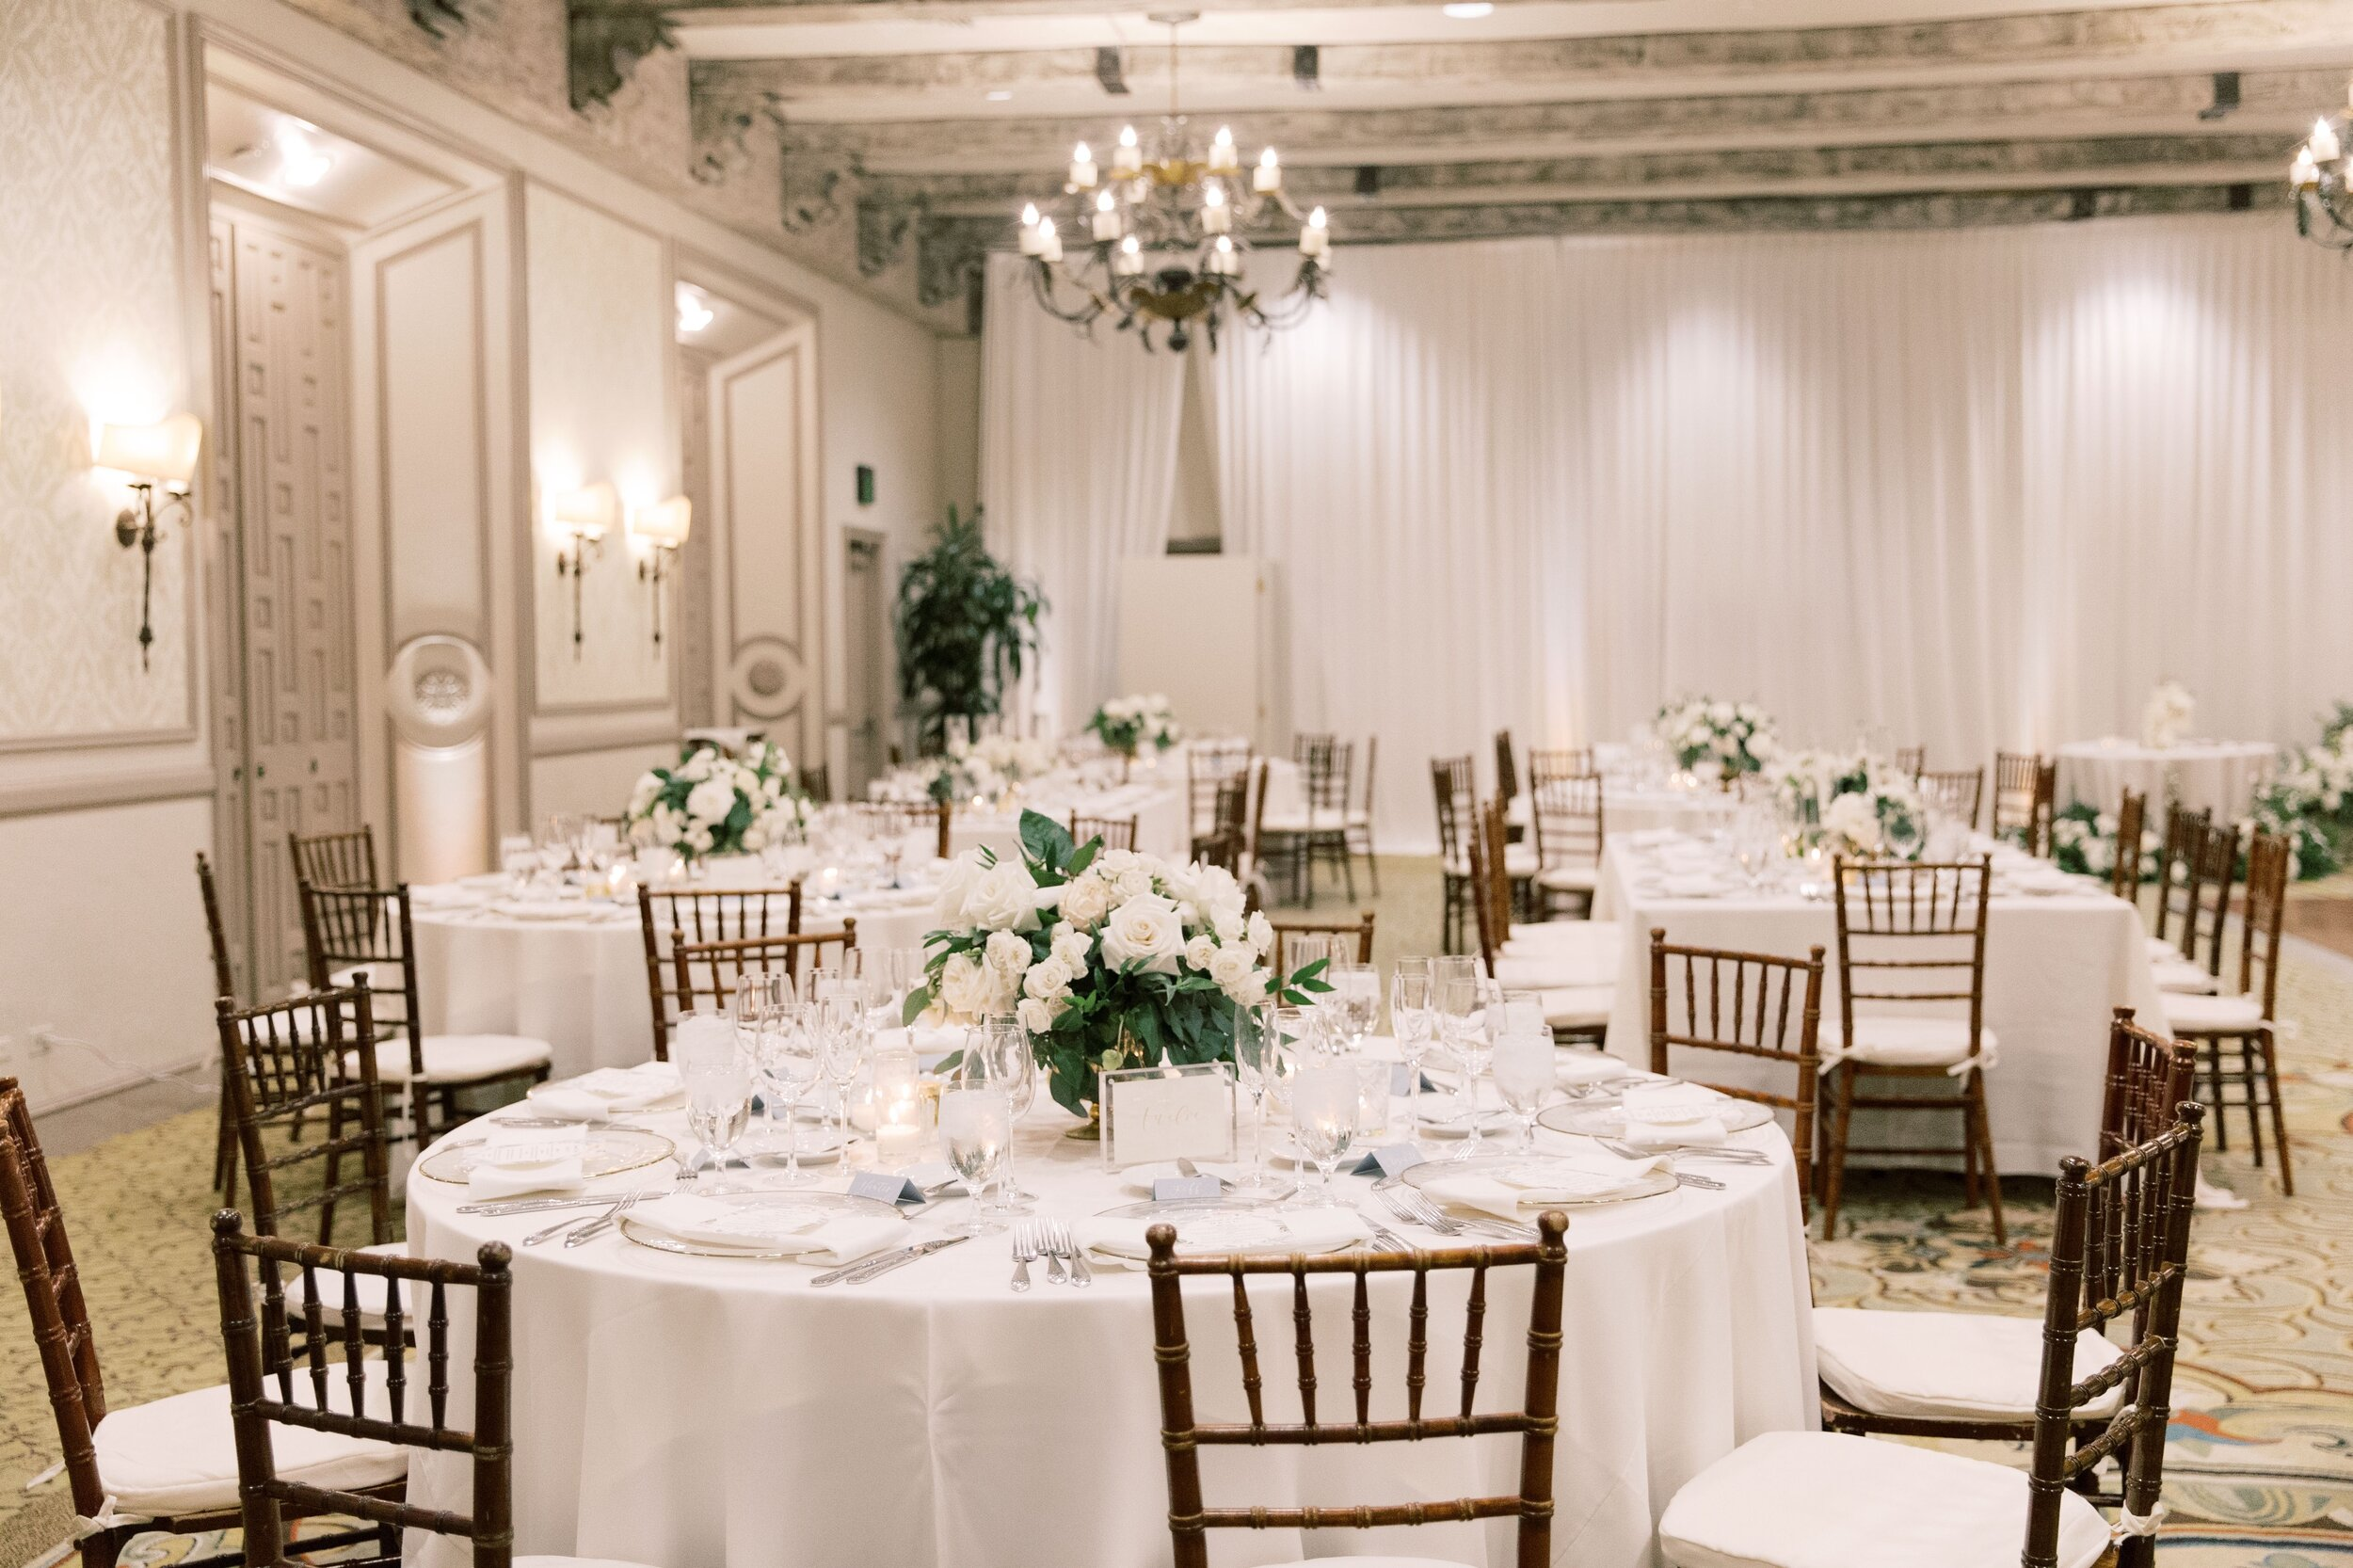 Wheeler_Rancho_Bernardo_Inn_San_Diego_California_Wedding_Devon_Donnahoo_Photography_0875.jpg.jpeg